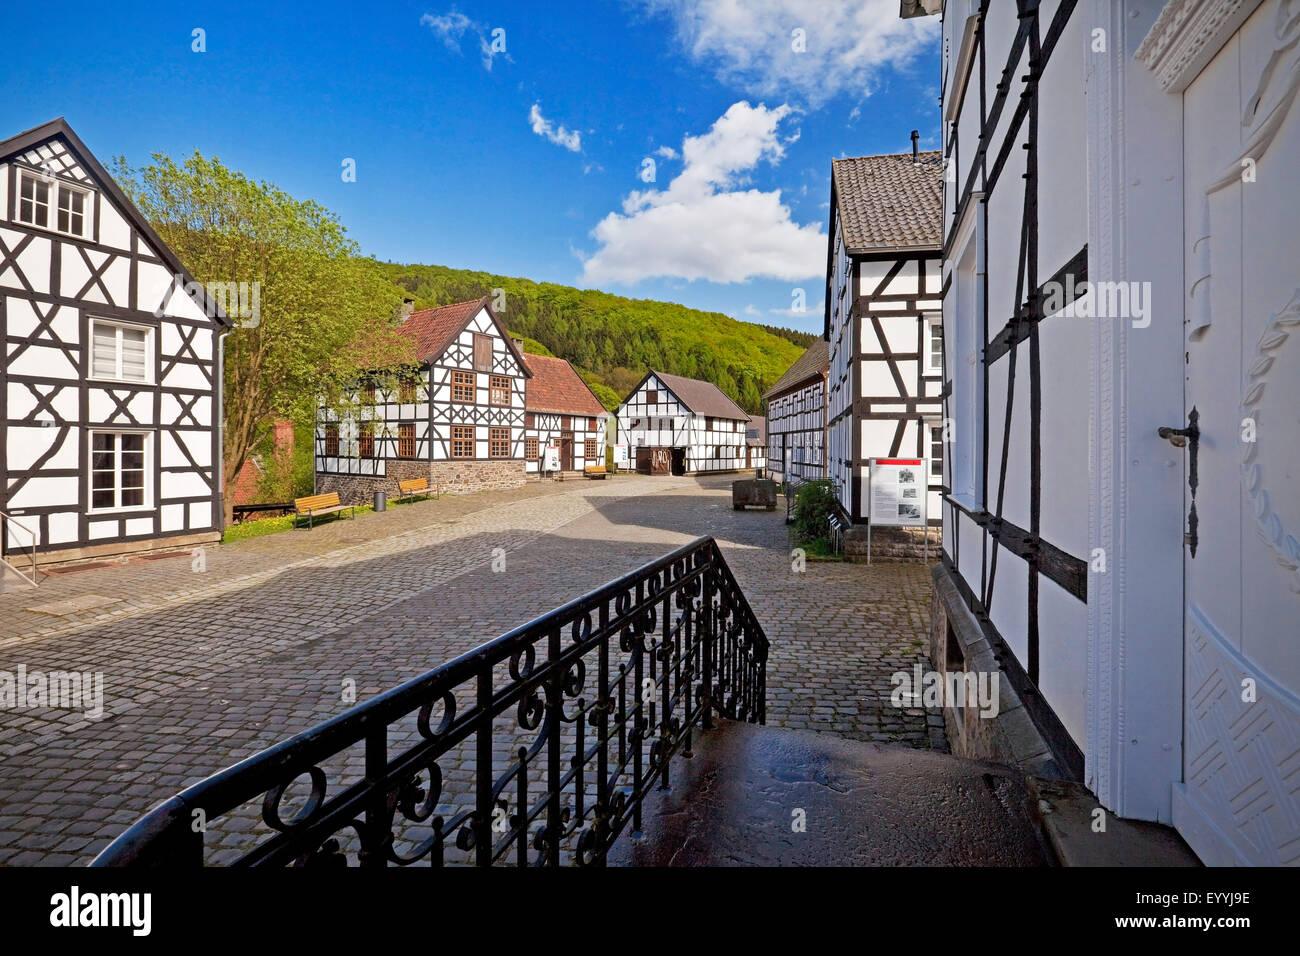 half-timbered houses of Hagen Open-air Museum, Germany, North Rhine-Westphalia, Ruhr Area, Hagen - Stock Image